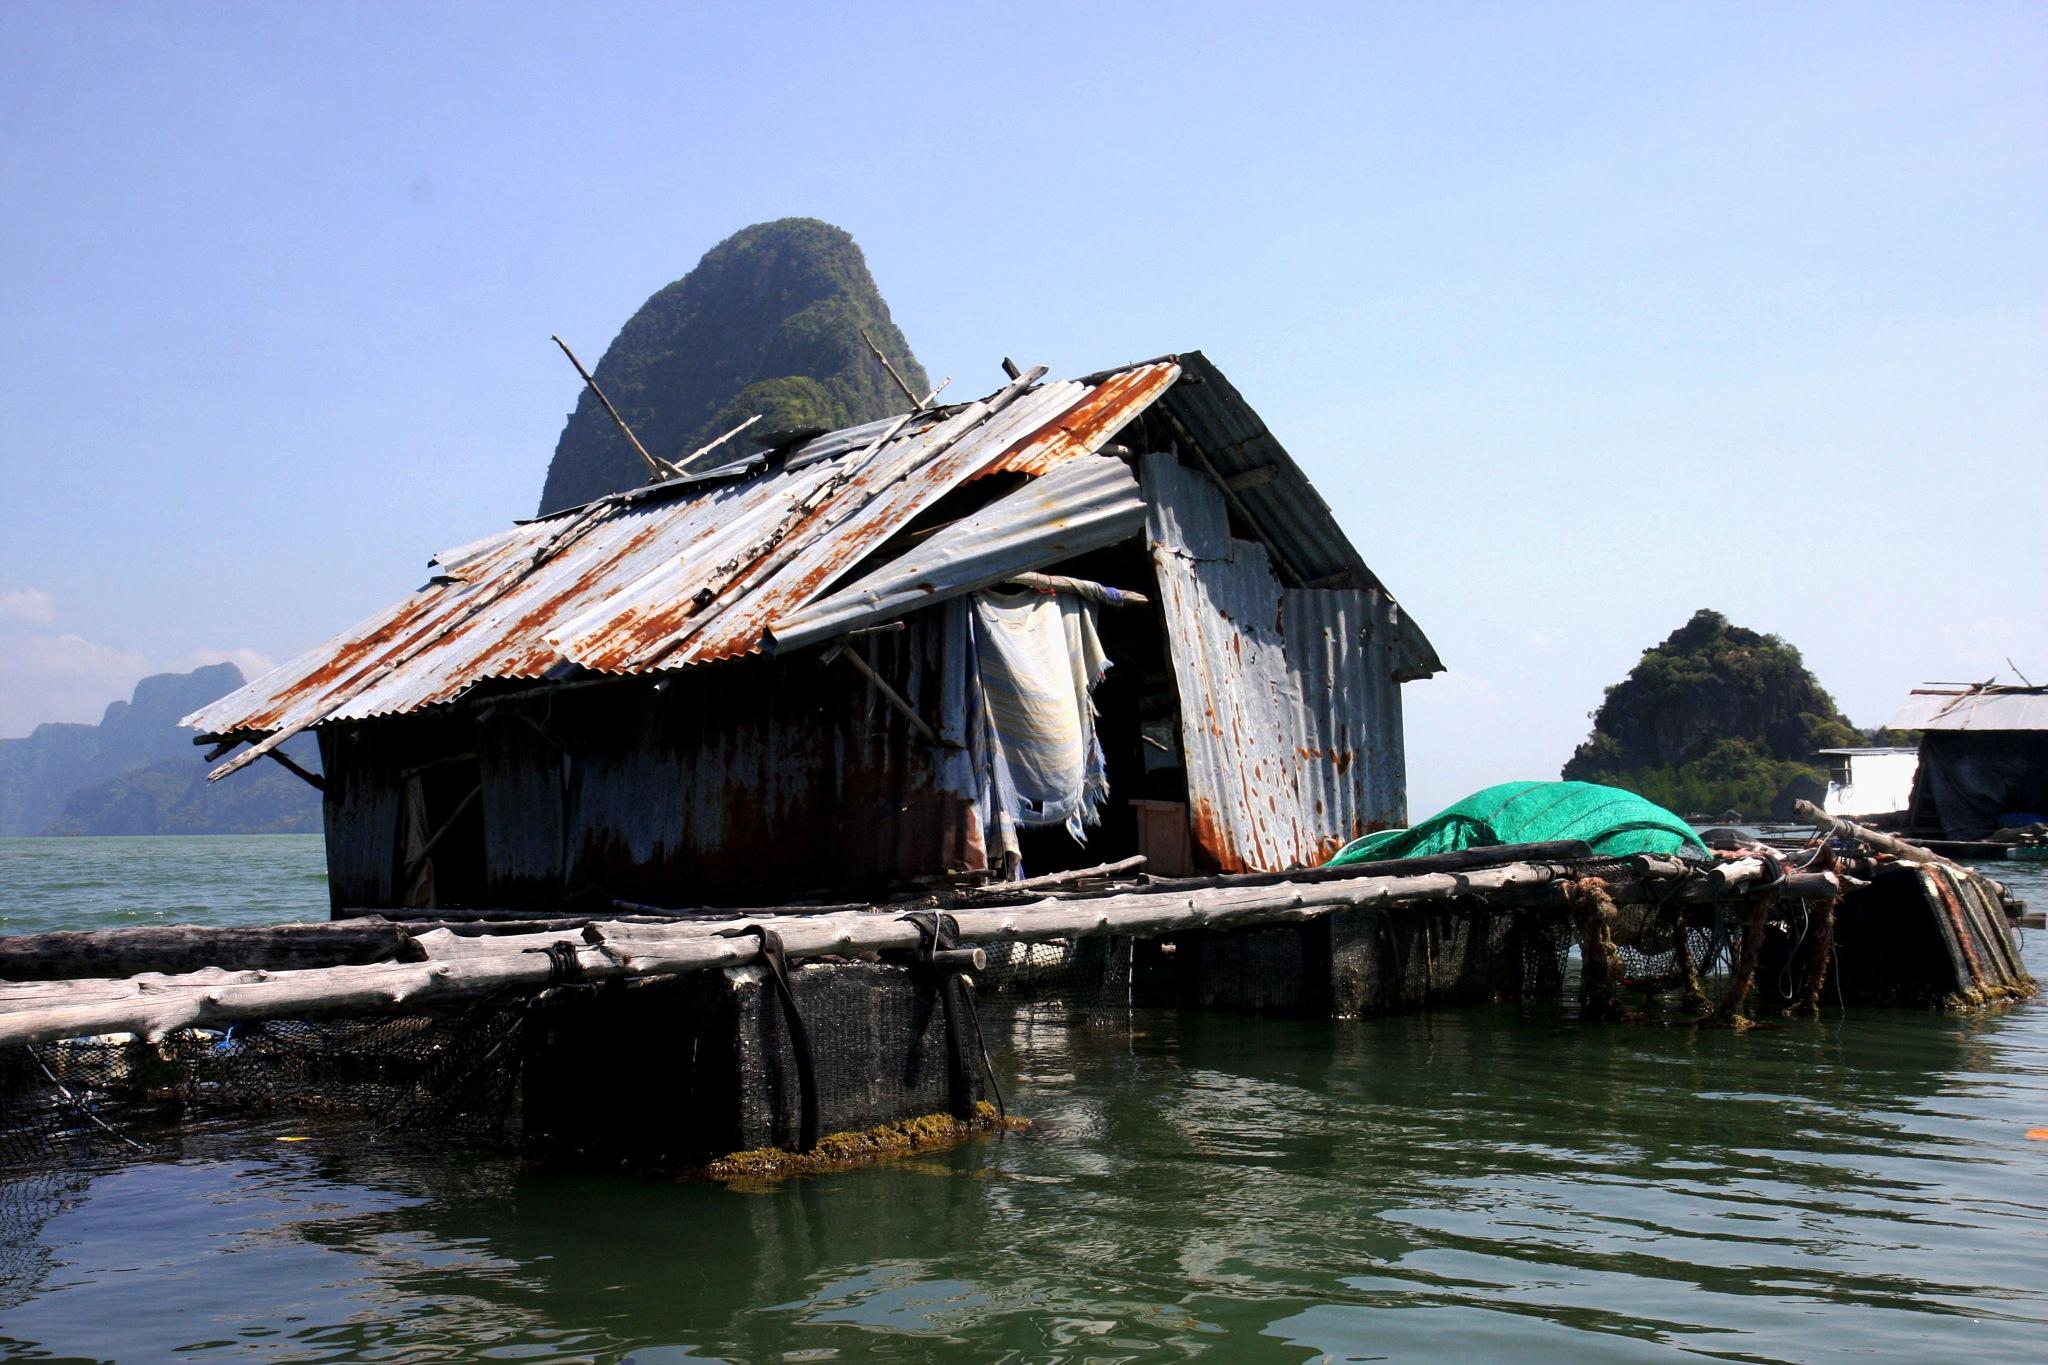 Fishing Shack in Phang Nga Bay, Thailand by Wendy Farrington